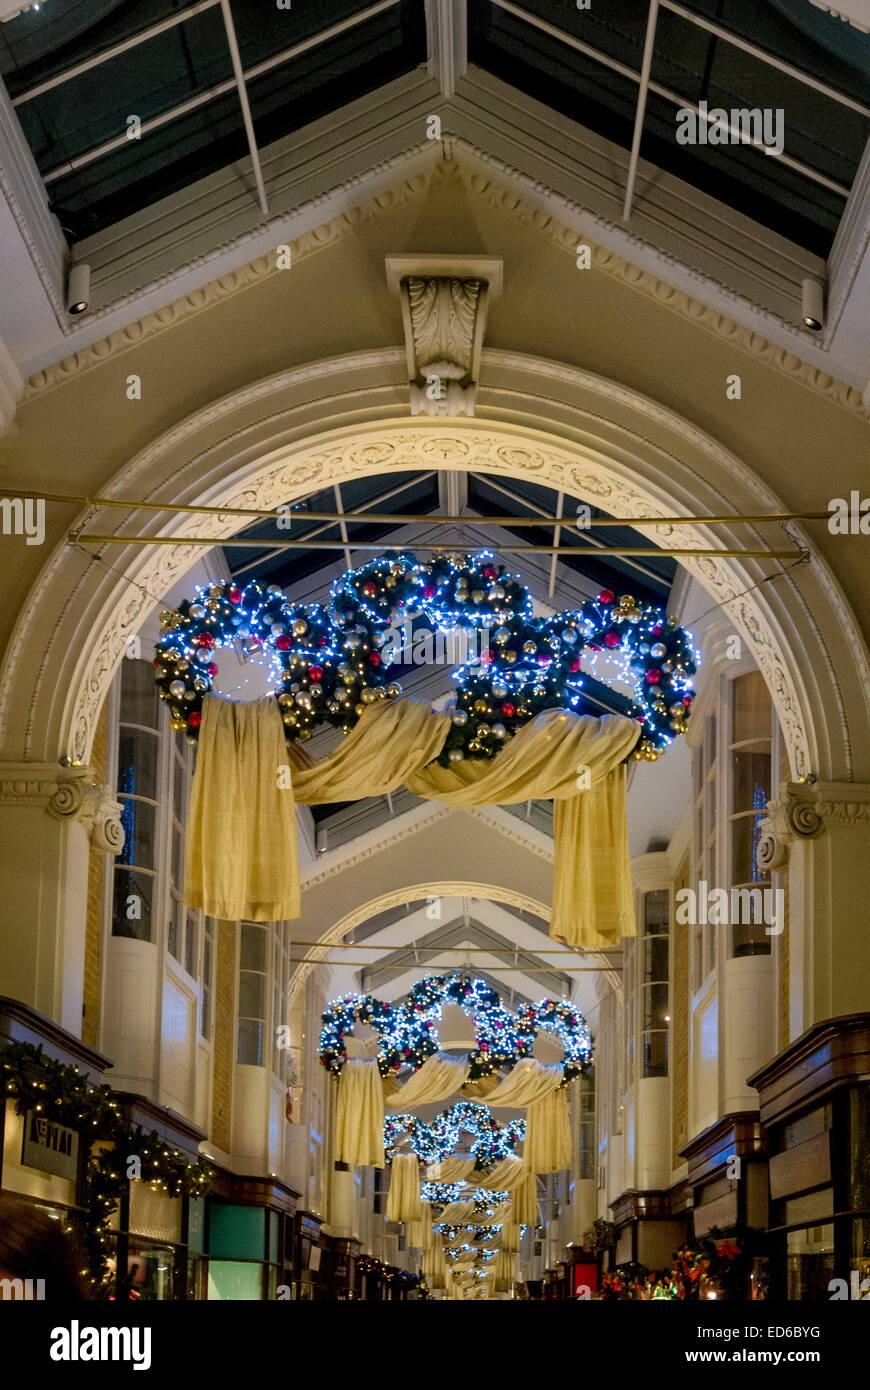 Christmas decorations in Burlington Arcade, London, UK. - Stock Image